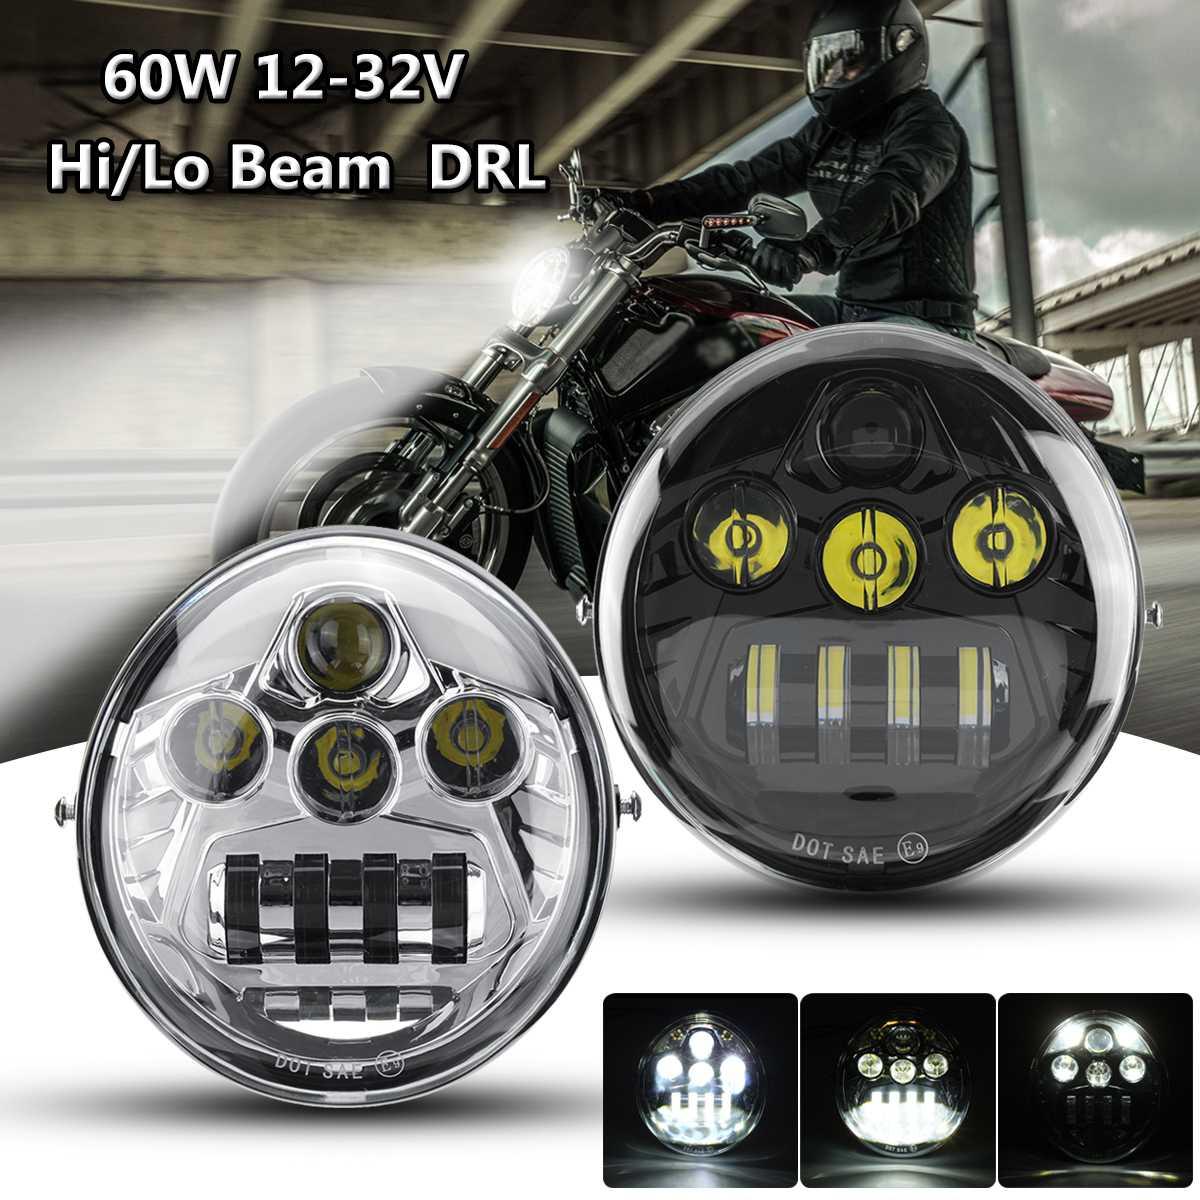 DOT E9 60 W moto phare LED hi-lo faisceau DRL pour Harley pour Davidson VROD VRSCDOT E9 60 W moto phare LED hi-lo faisceau DRL pour Harley pour Davidson VROD VRSC